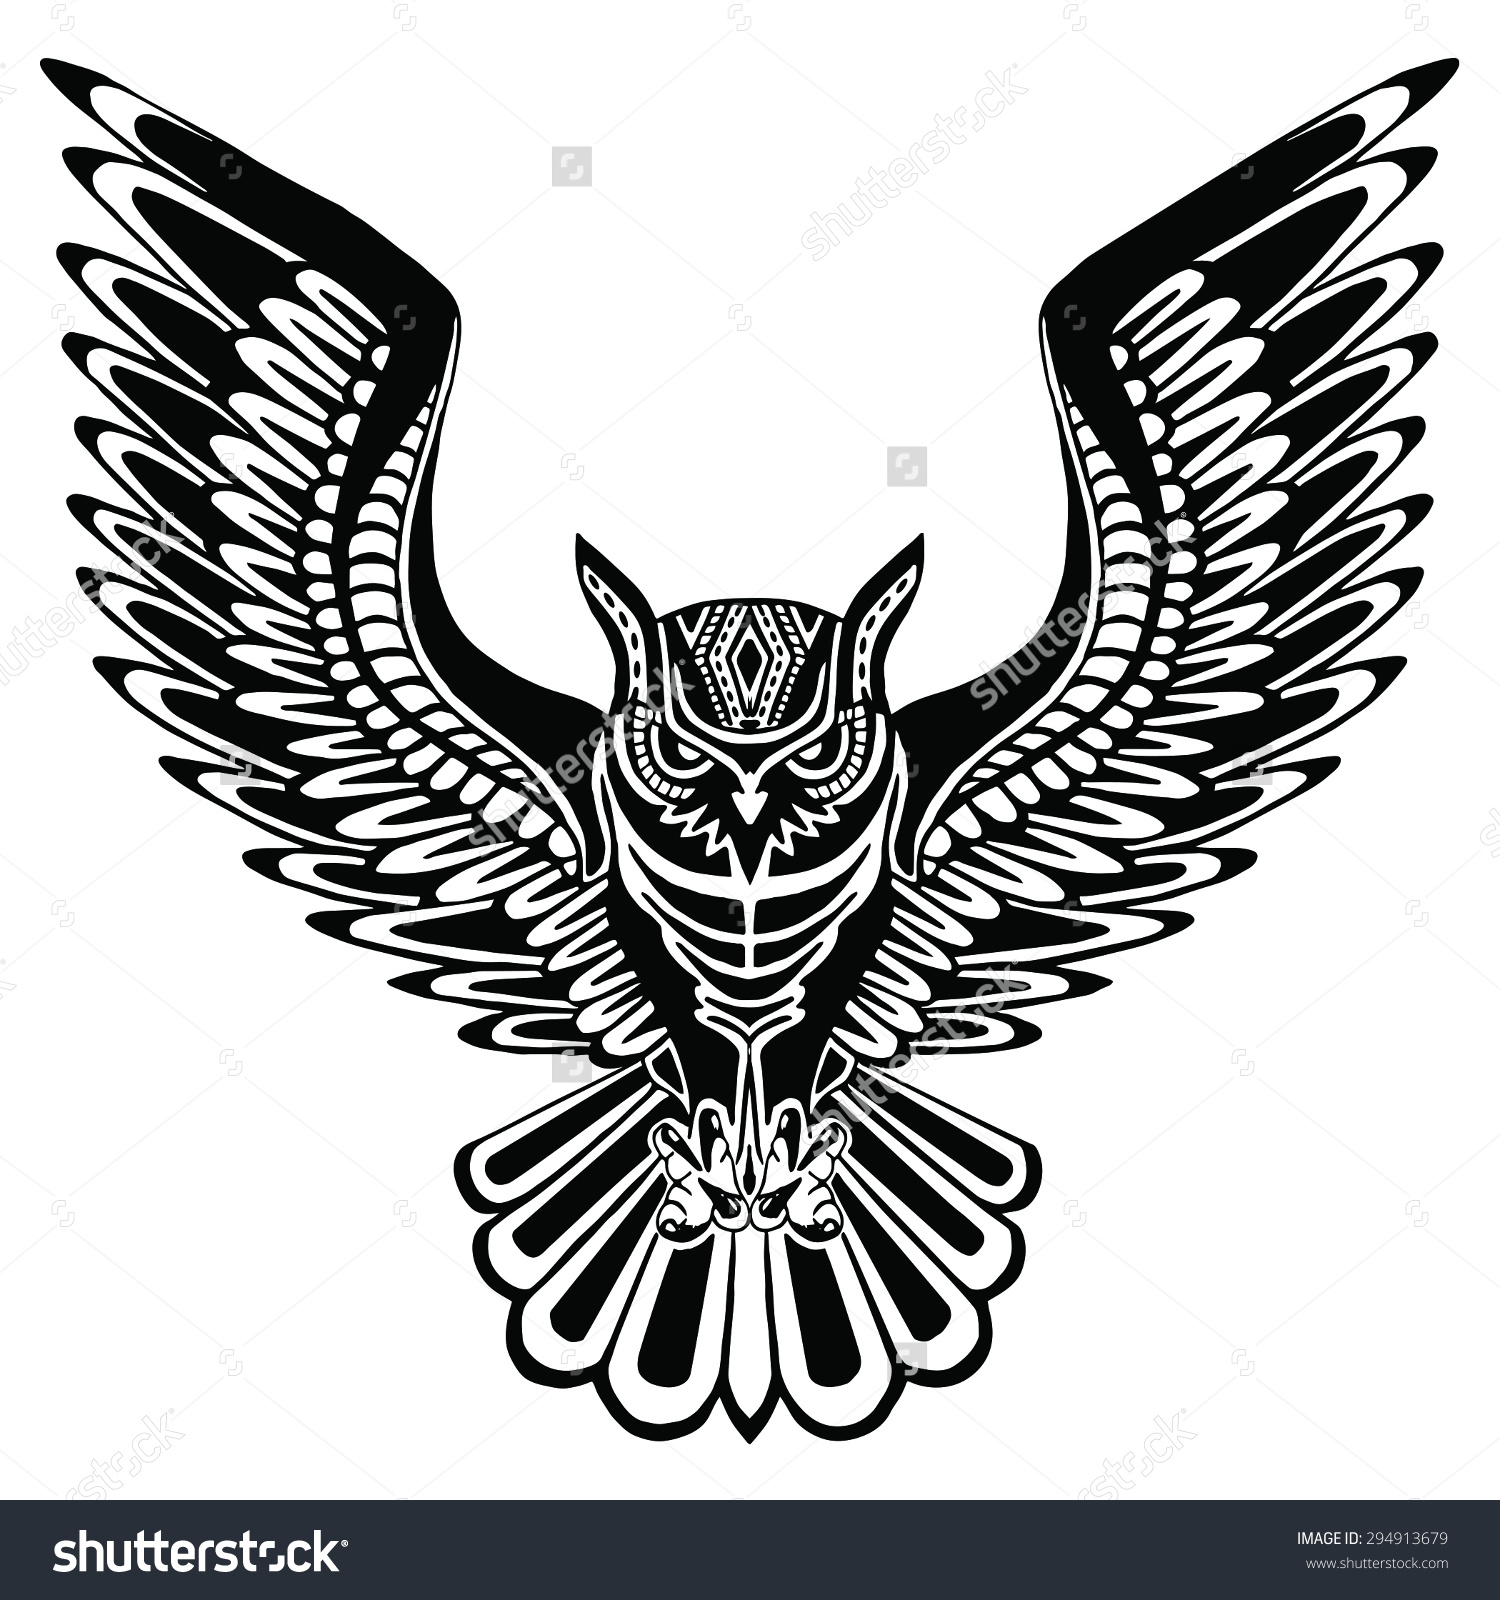 Drawn owl tribal #11